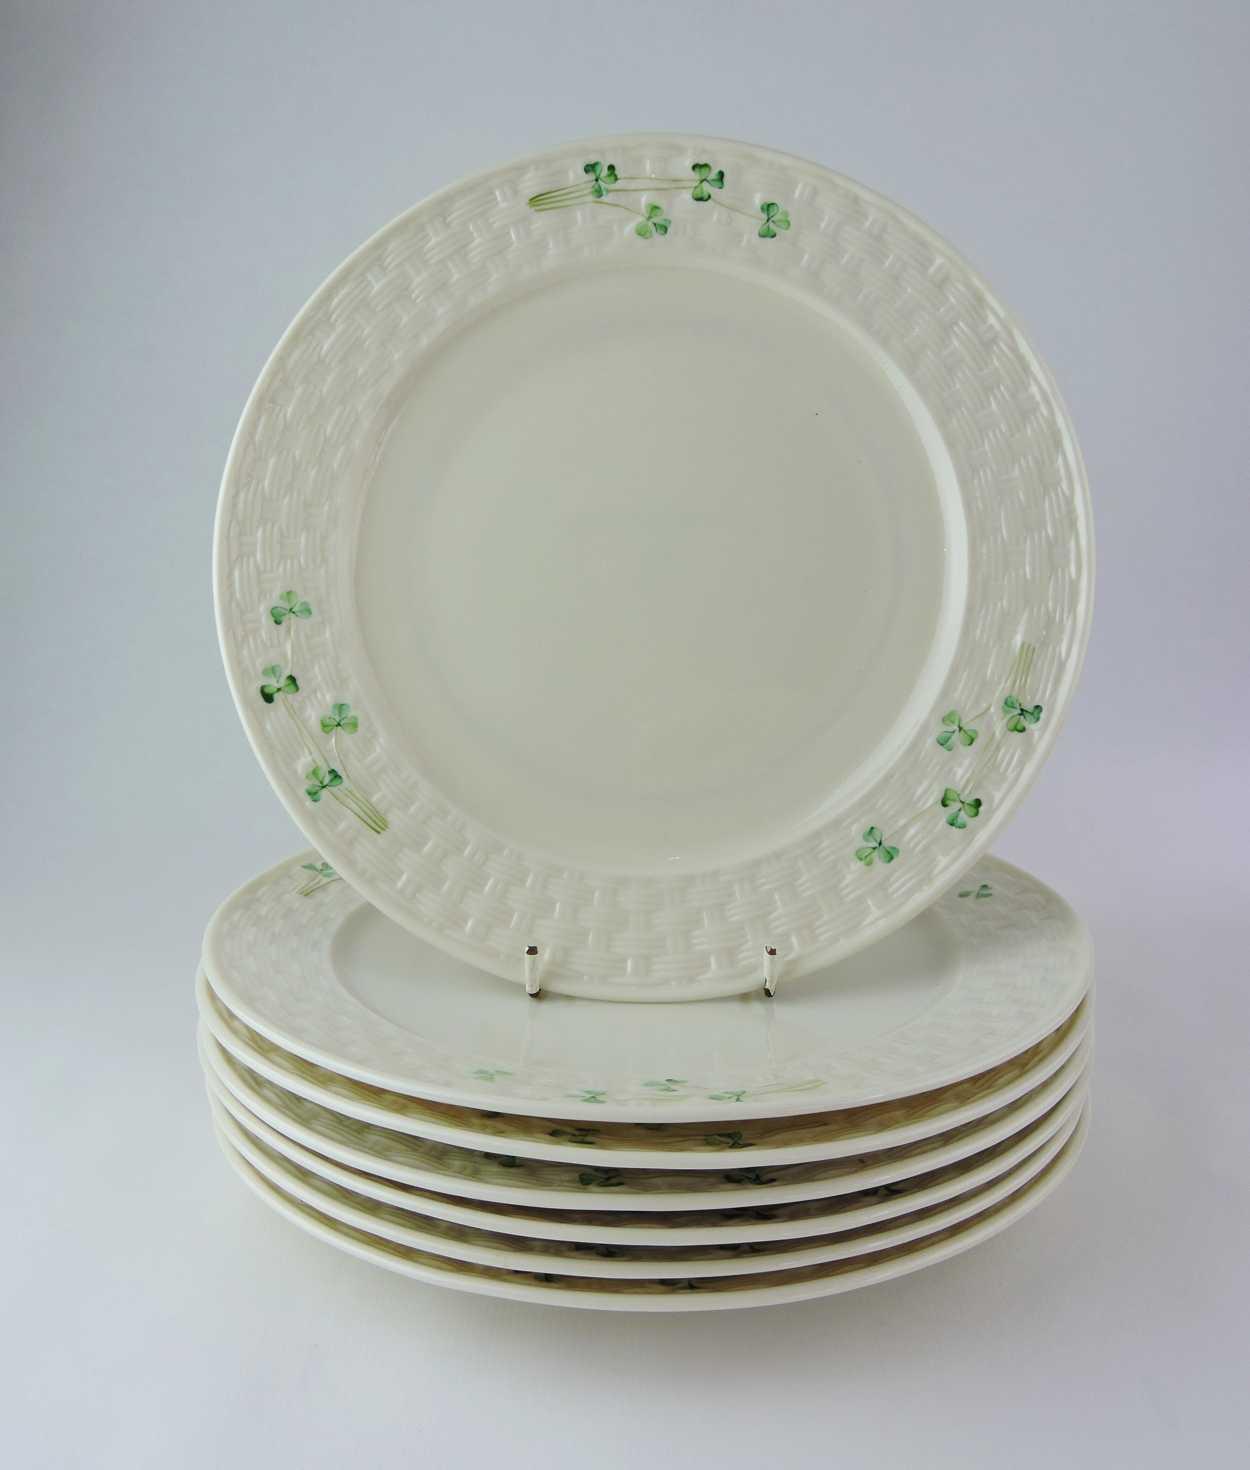 Irish Belleek Shamrock Dinner Plates Bernardis Antiques & Tableware Ireland - Castrophotos